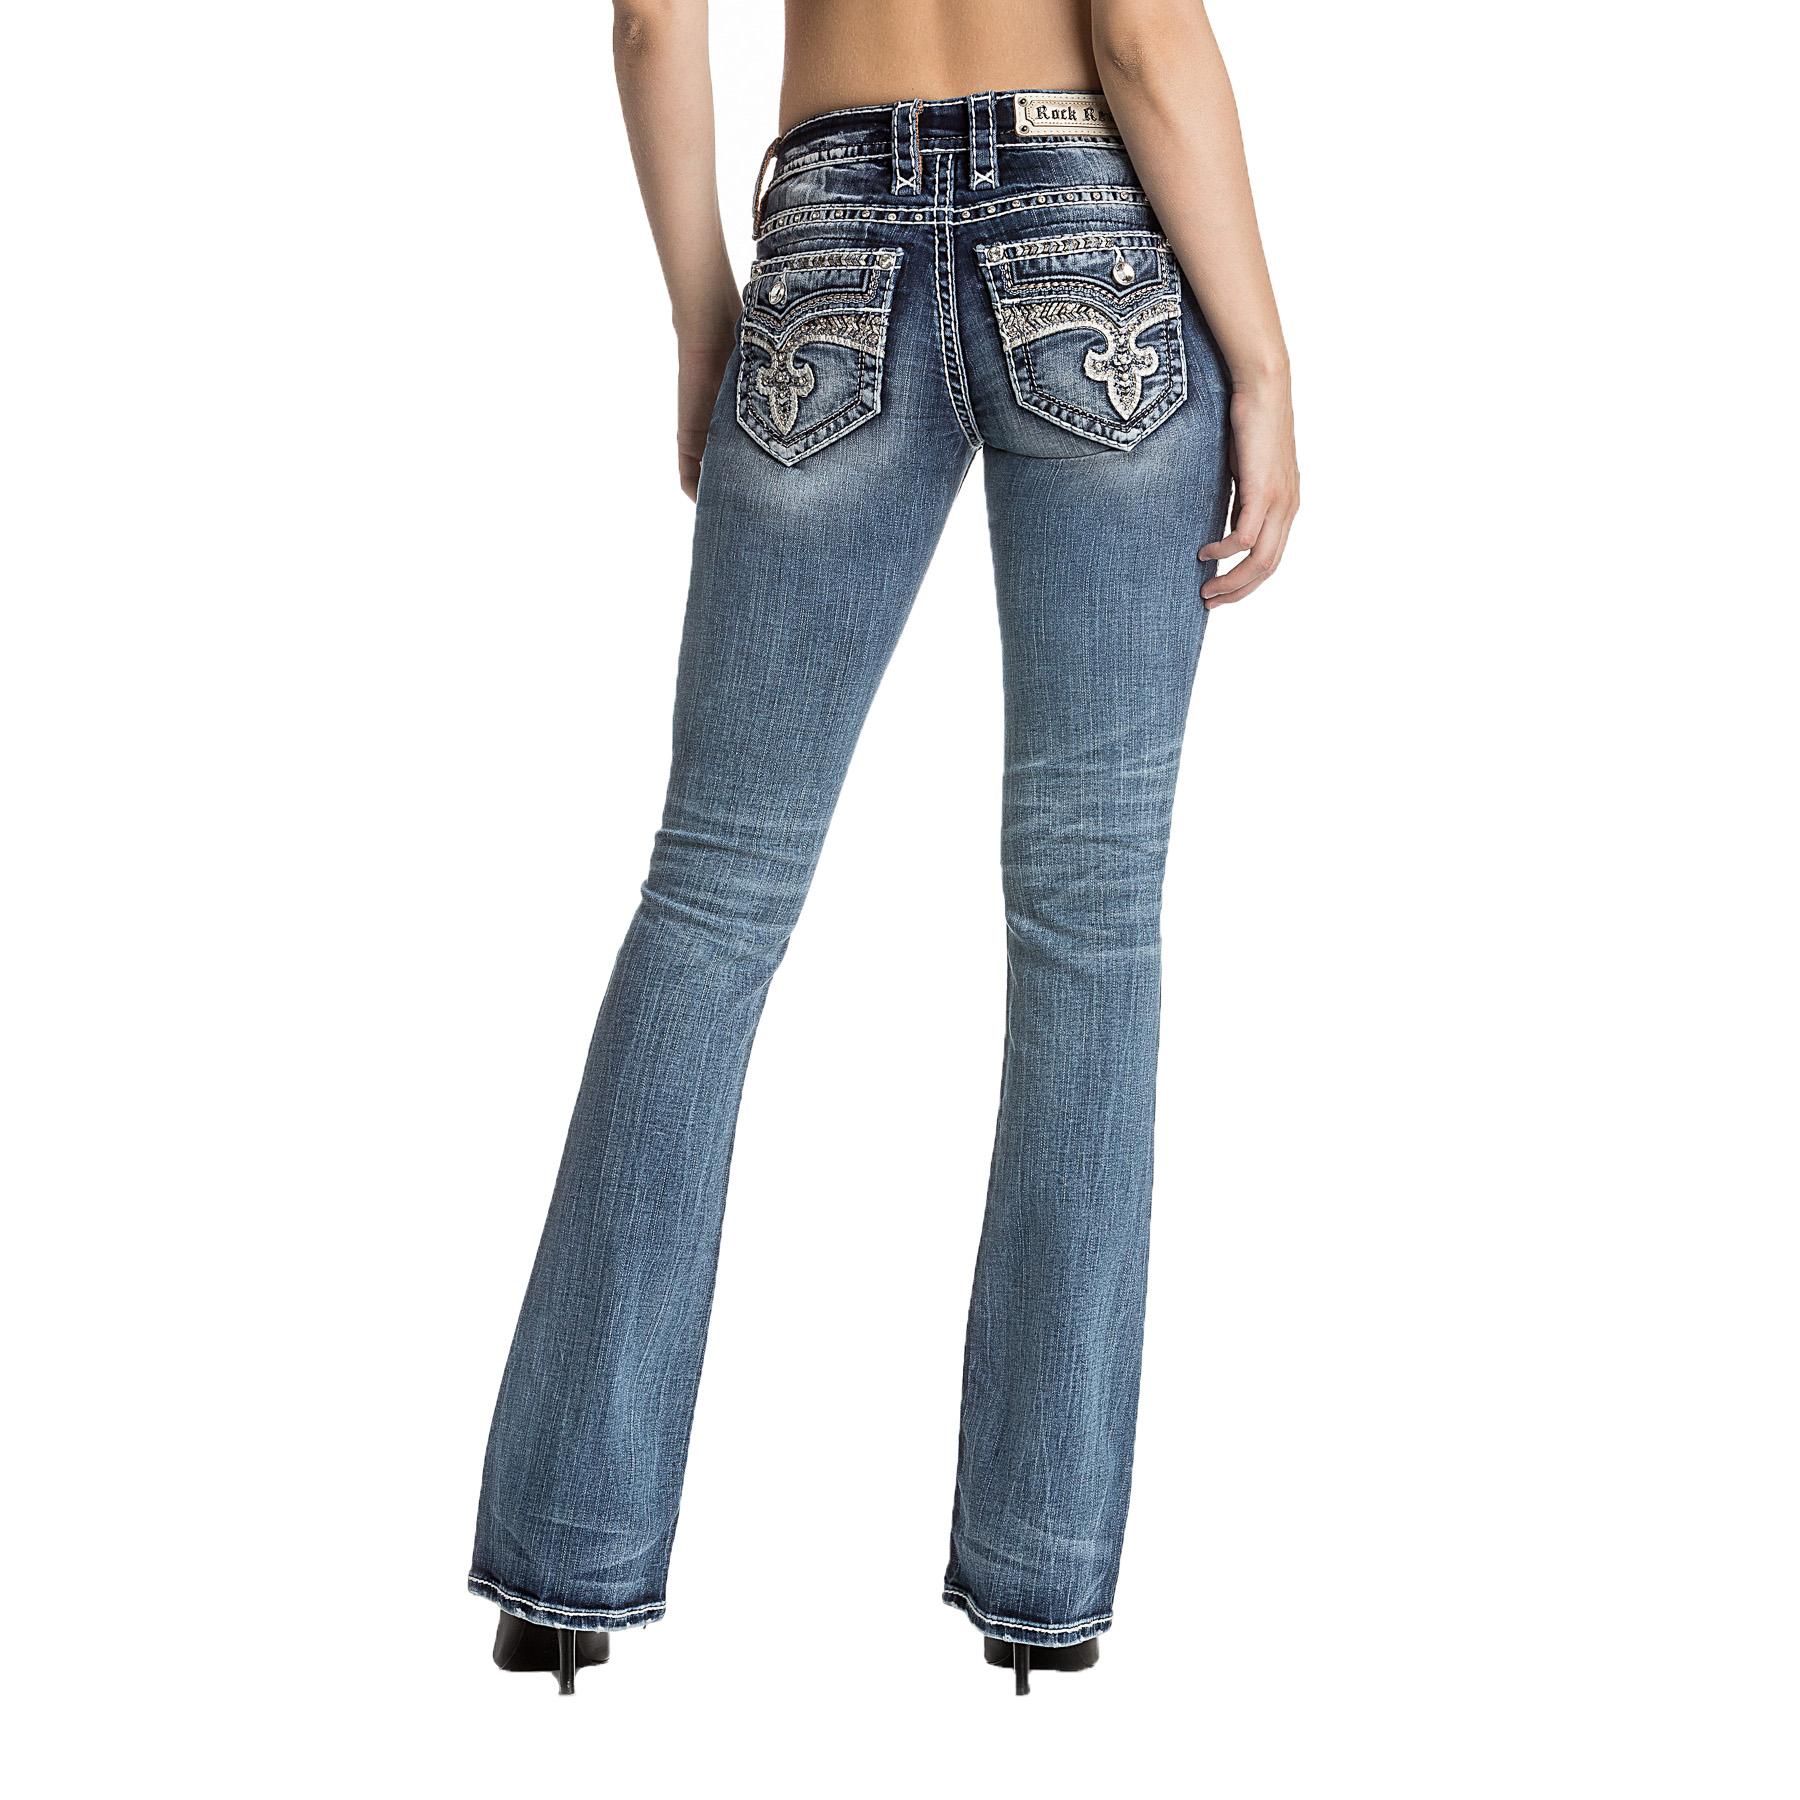 c5f29c7e7950 Women's Yui B228 Boot Cut Jean